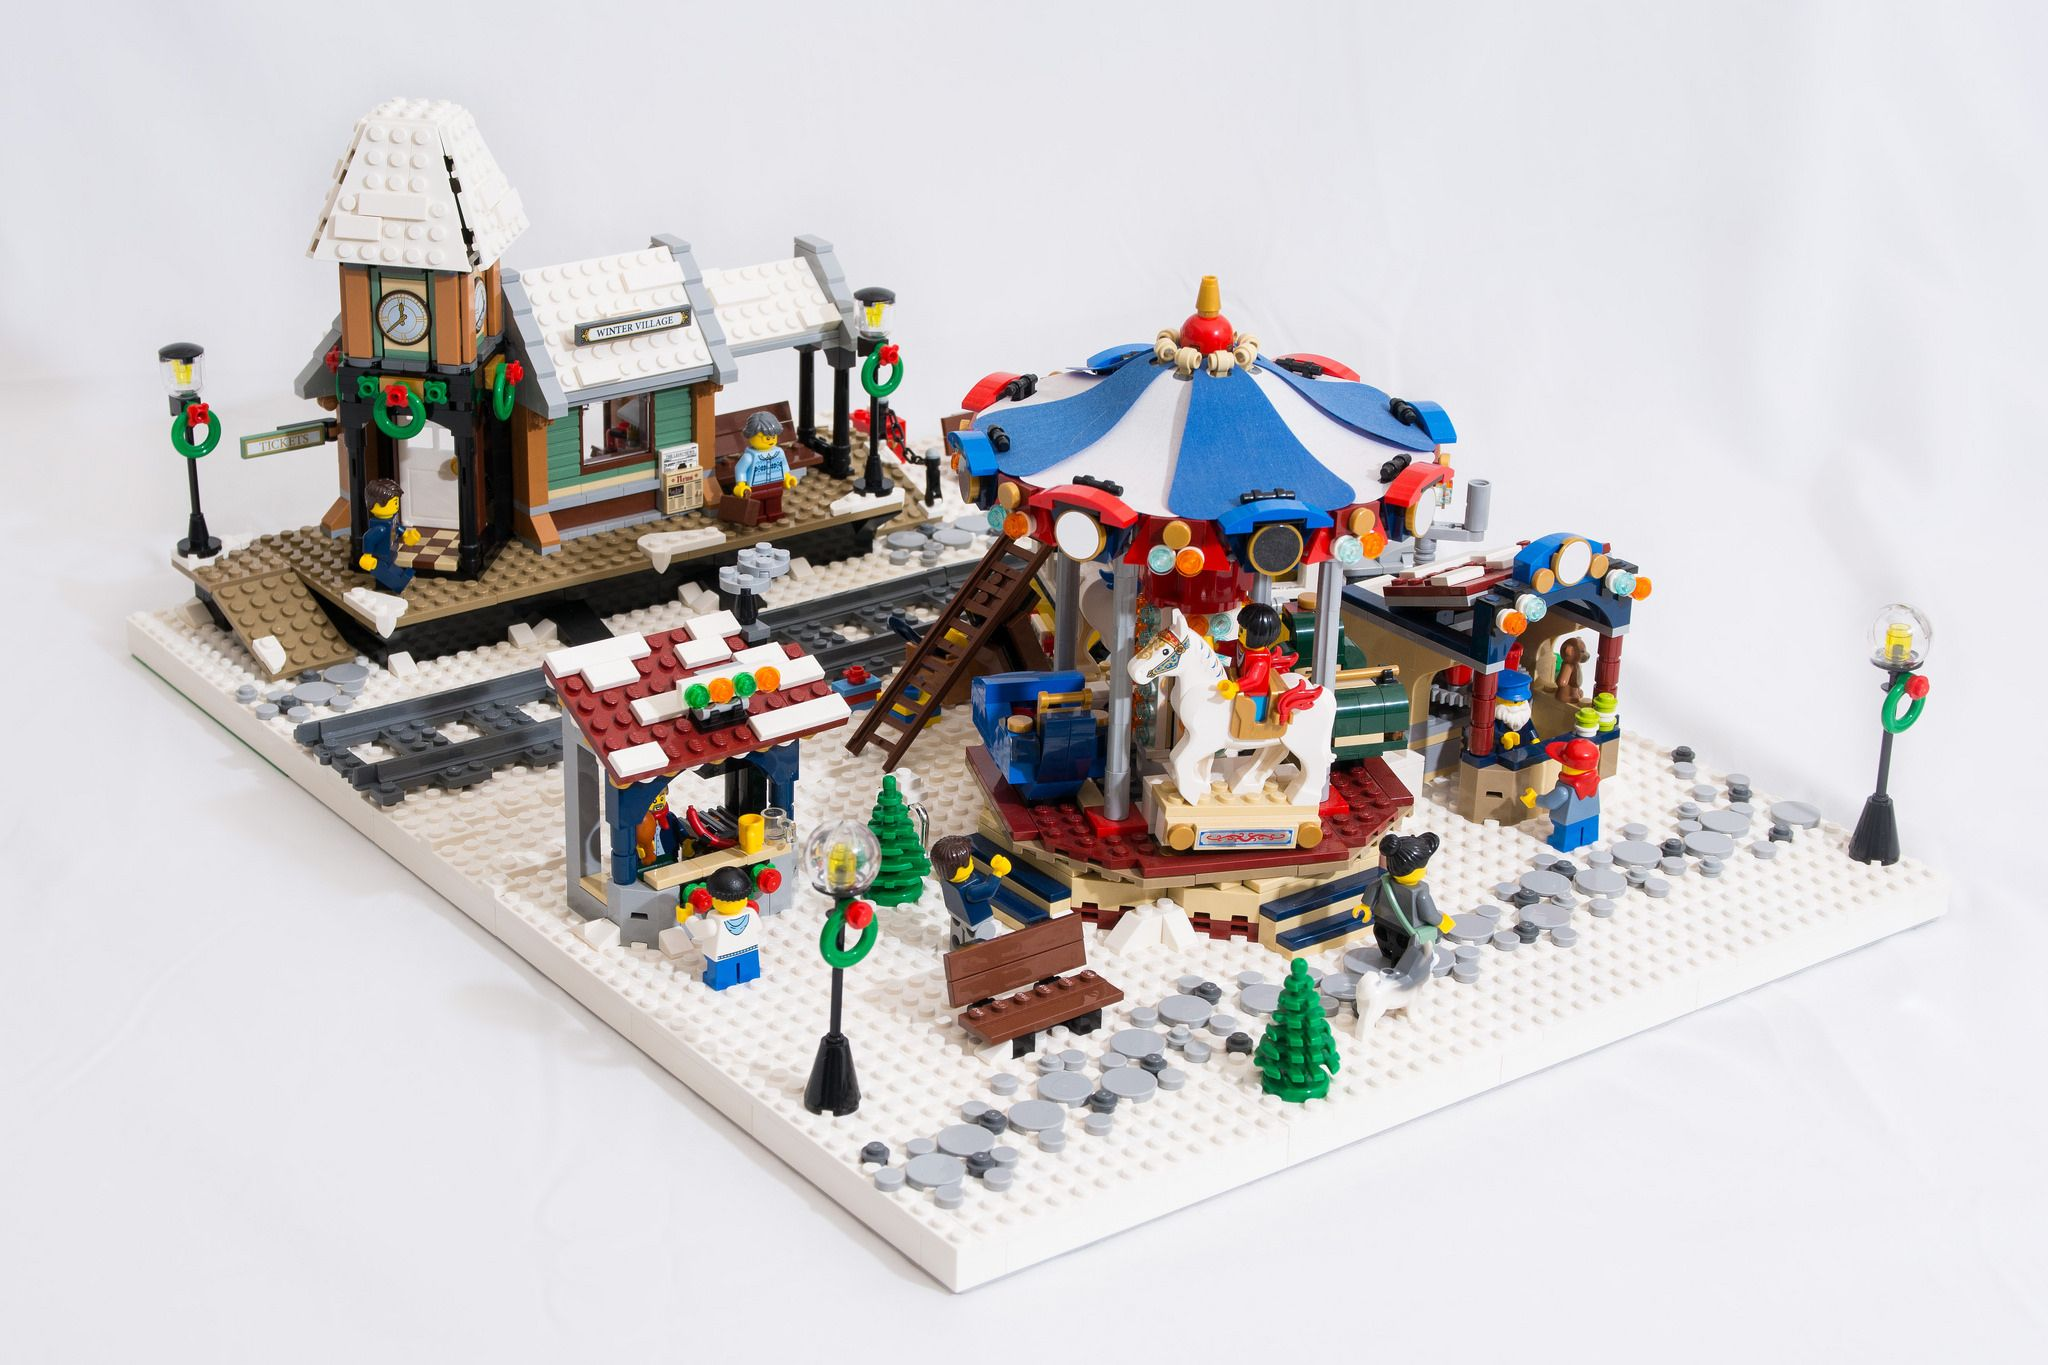 Winter Village Diorama 2017 Lego Christmas Village Lego Winter Lego Winter Village